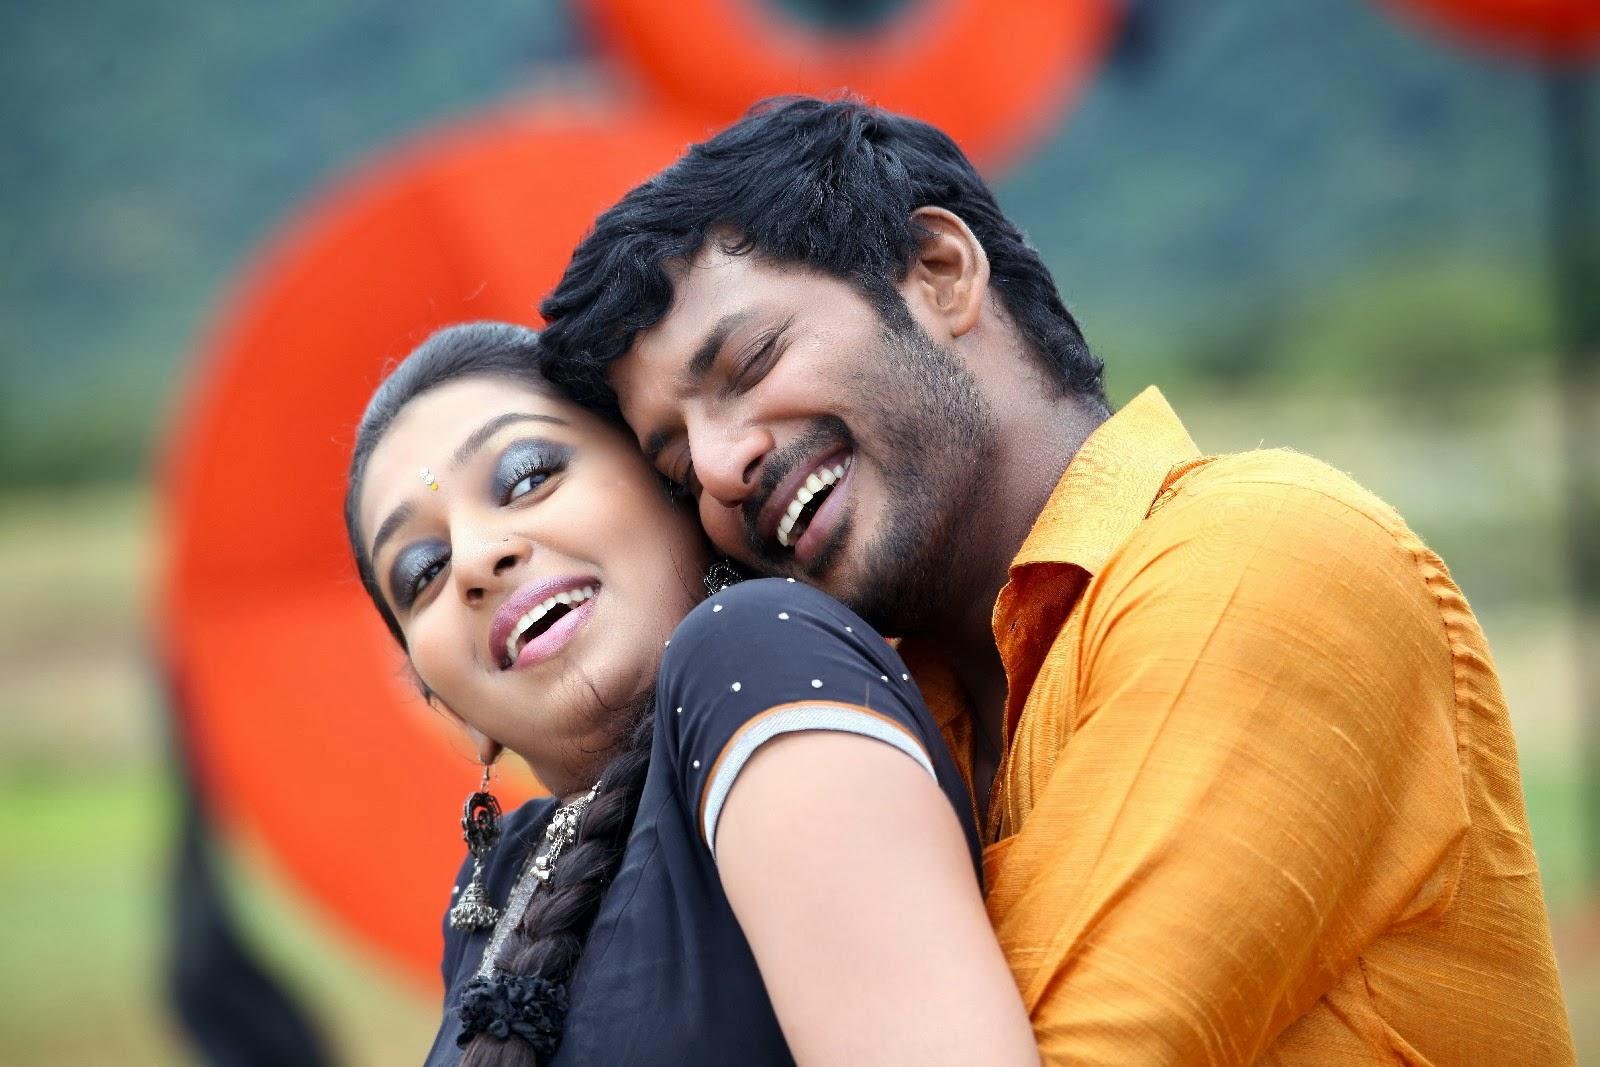 Palnadu Telugu movie review, palnadu review, Palnadu movie rating, Vishal Palnadu movie review.